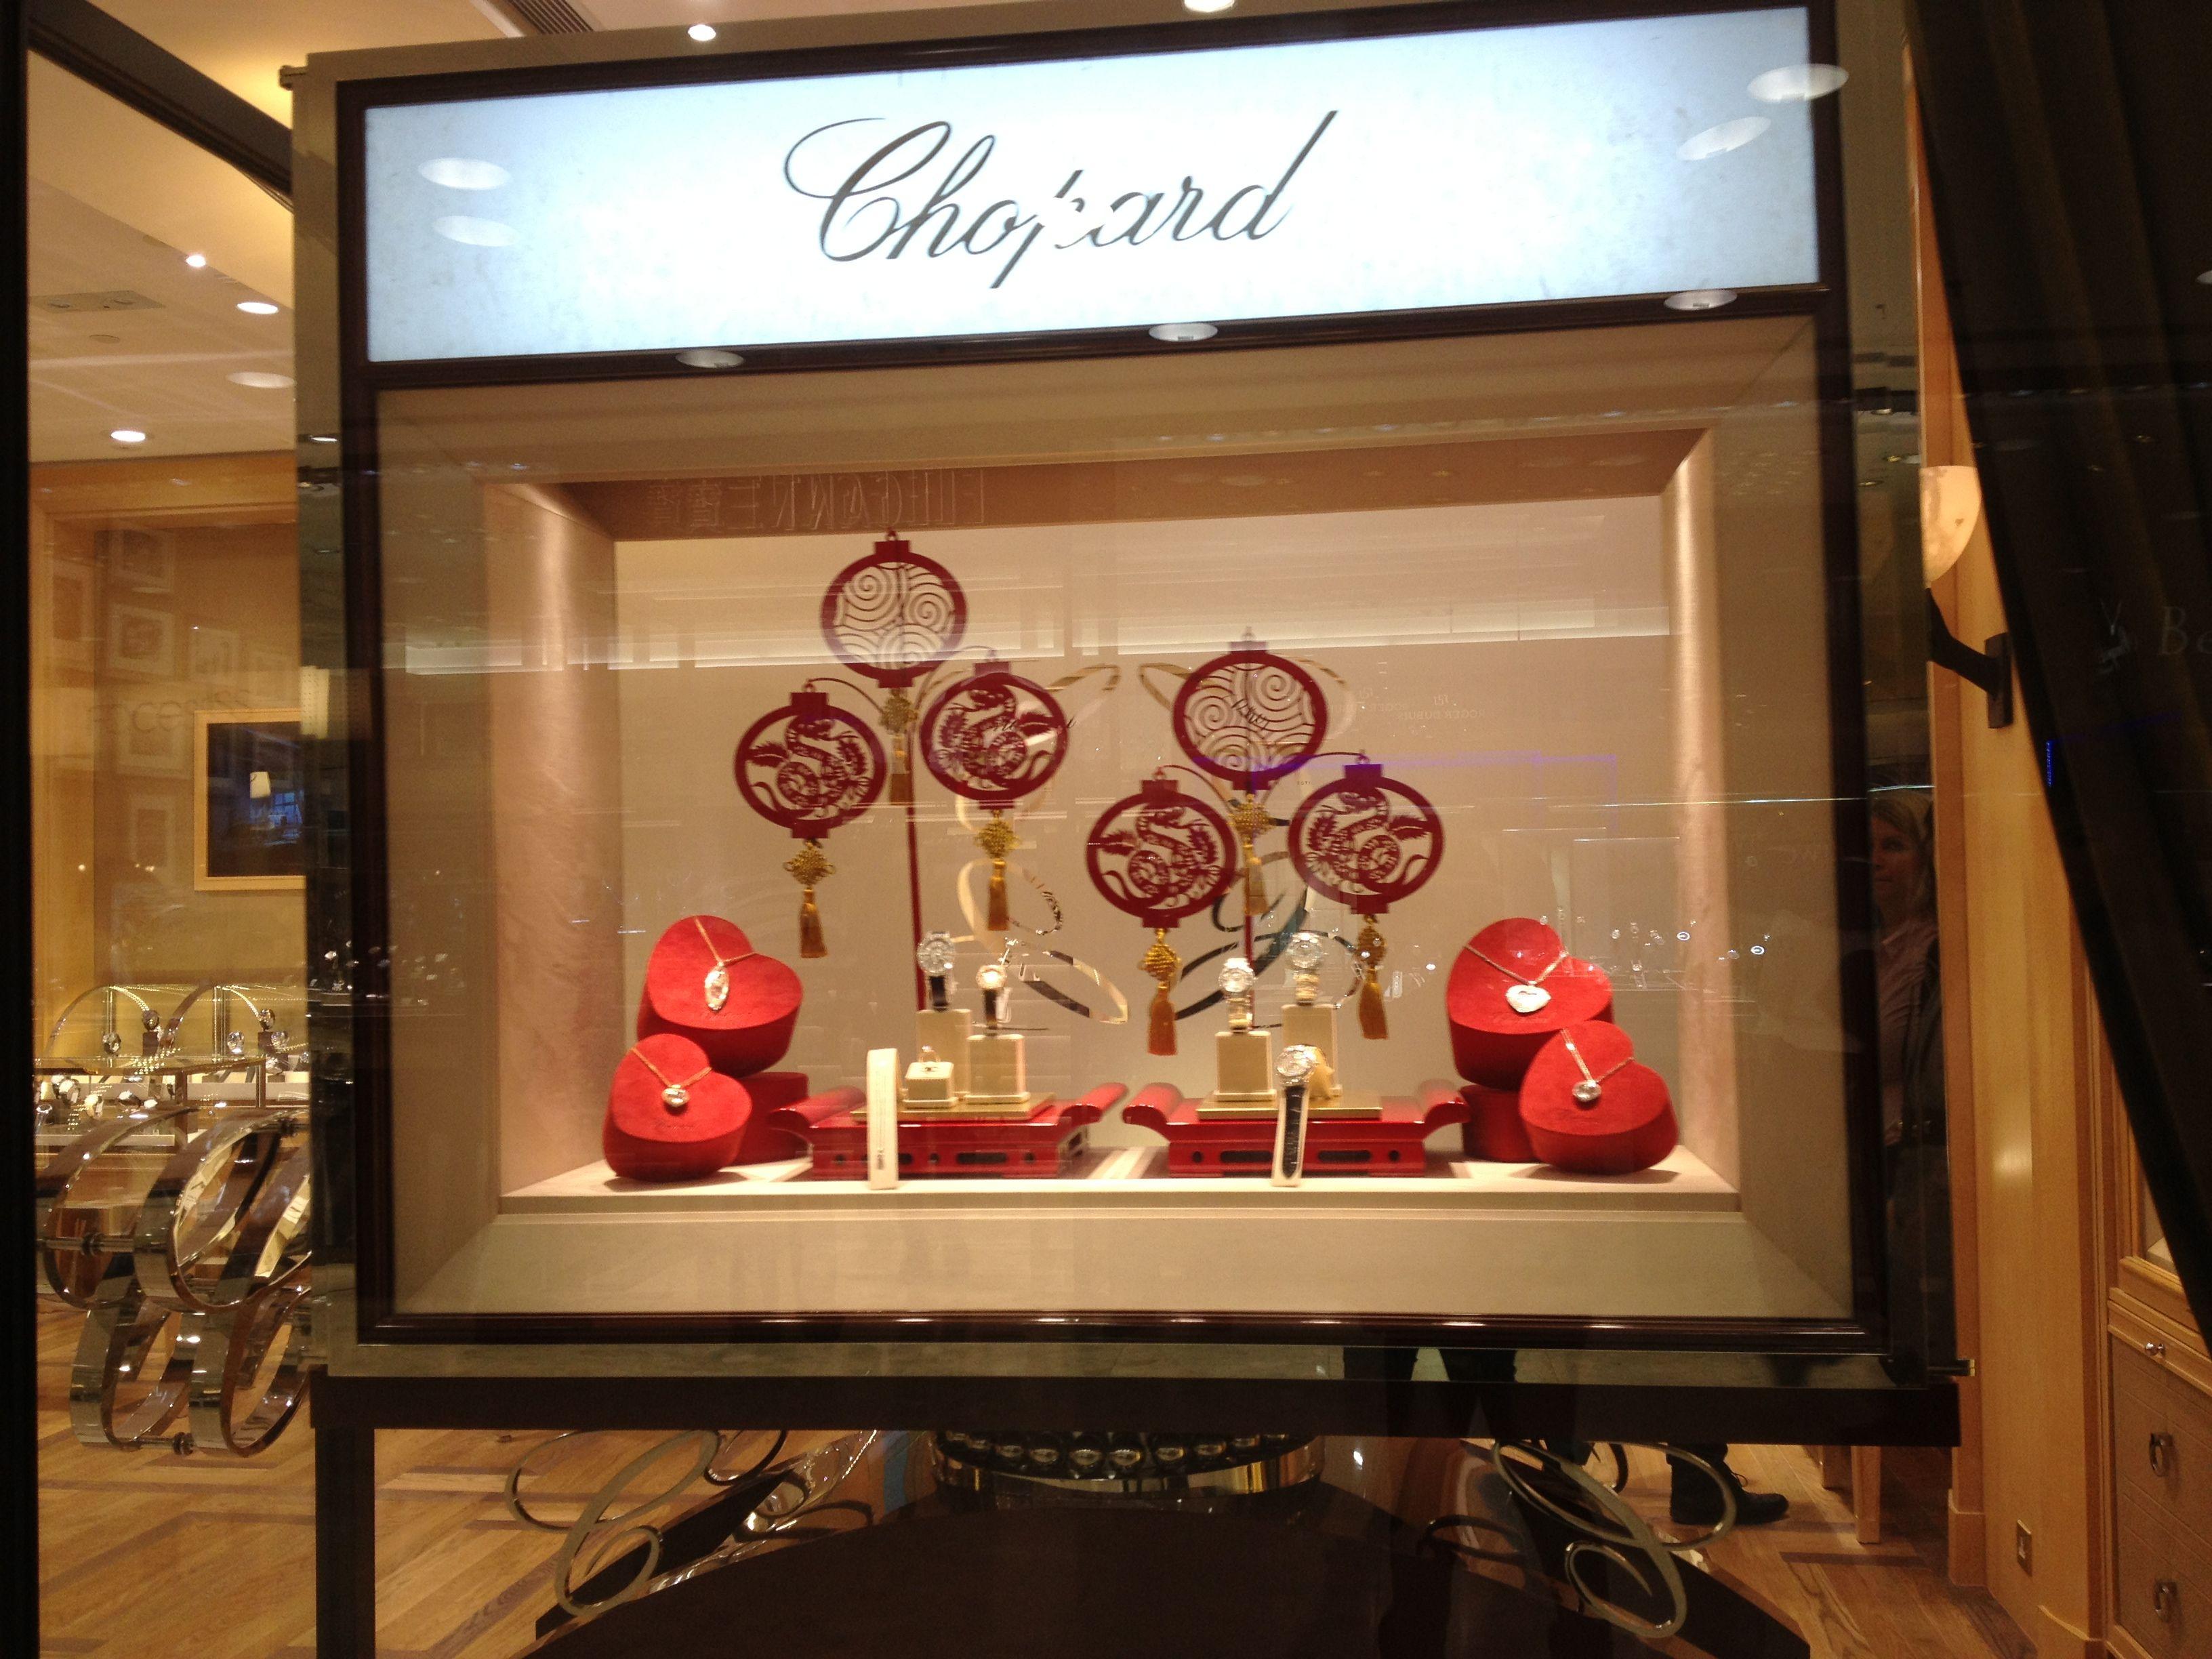 Chopard - CNY window display - Hong Kong - Jan 2013 ...